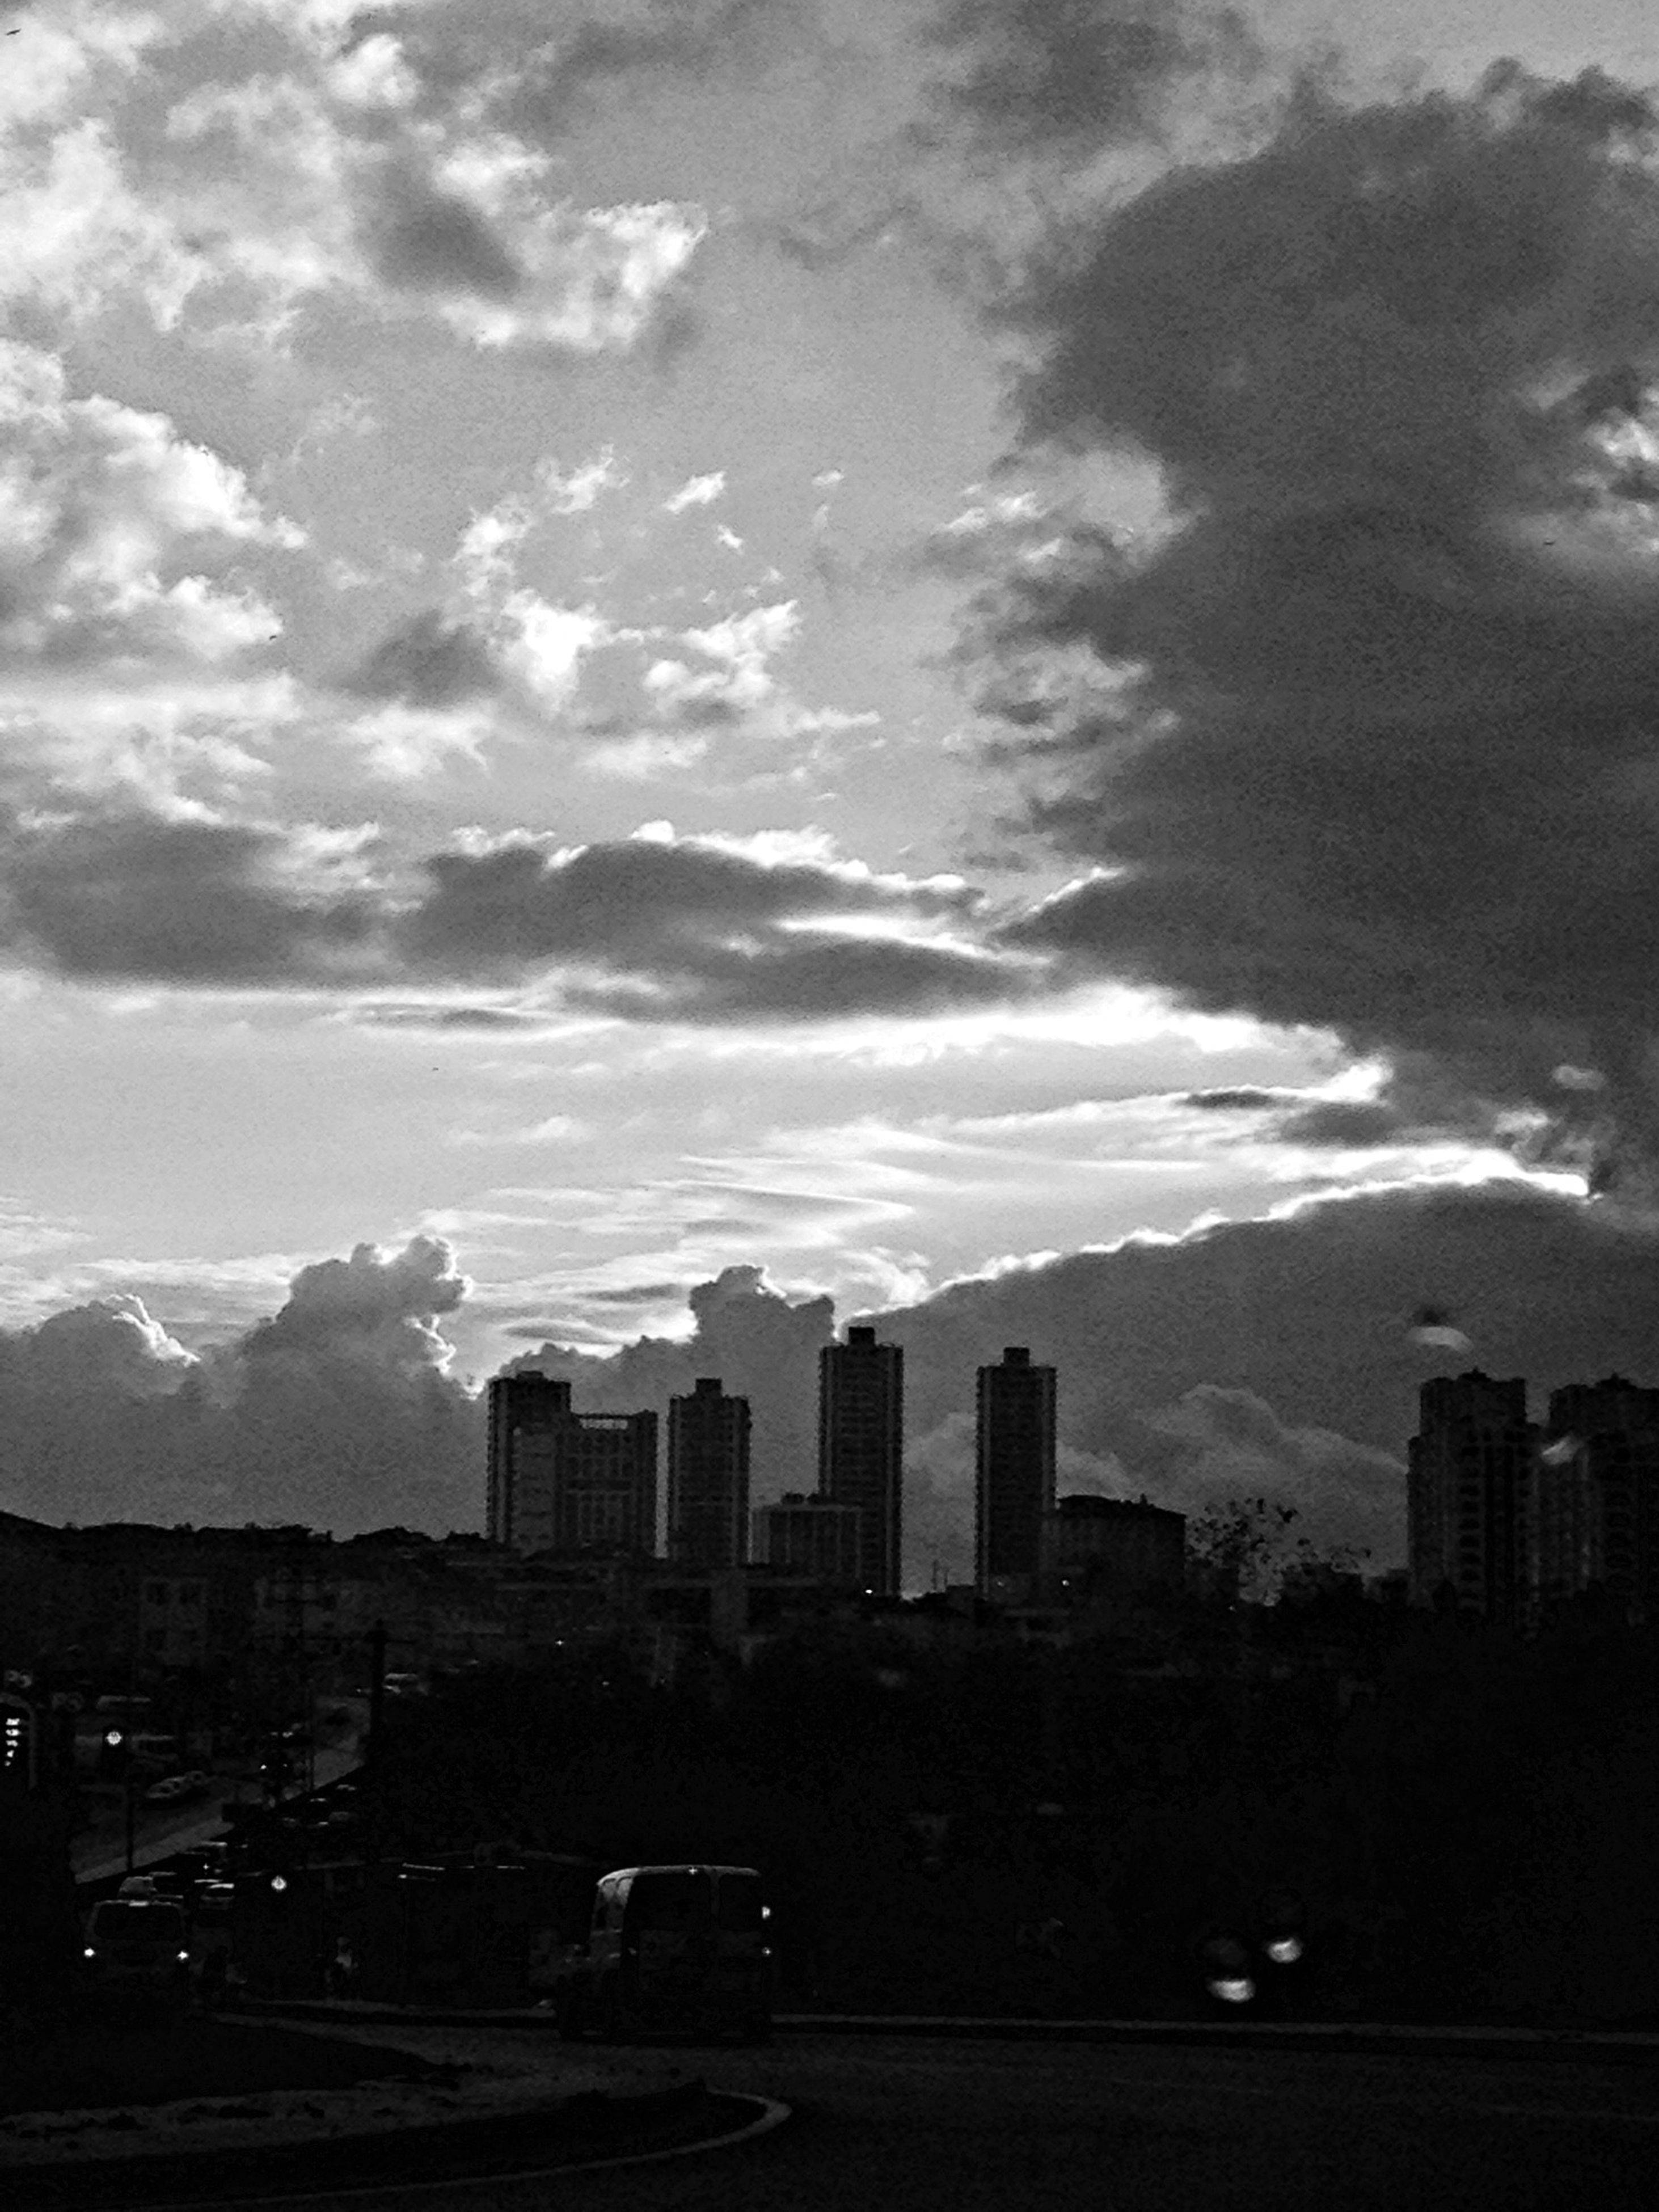 building exterior, architecture, built structure, city, sky, cloud - sky, skyscraper, cityscape, cloudy, office building, modern, tall - high, city life, building, cloud, tower, urban skyline, car, dusk, transportation